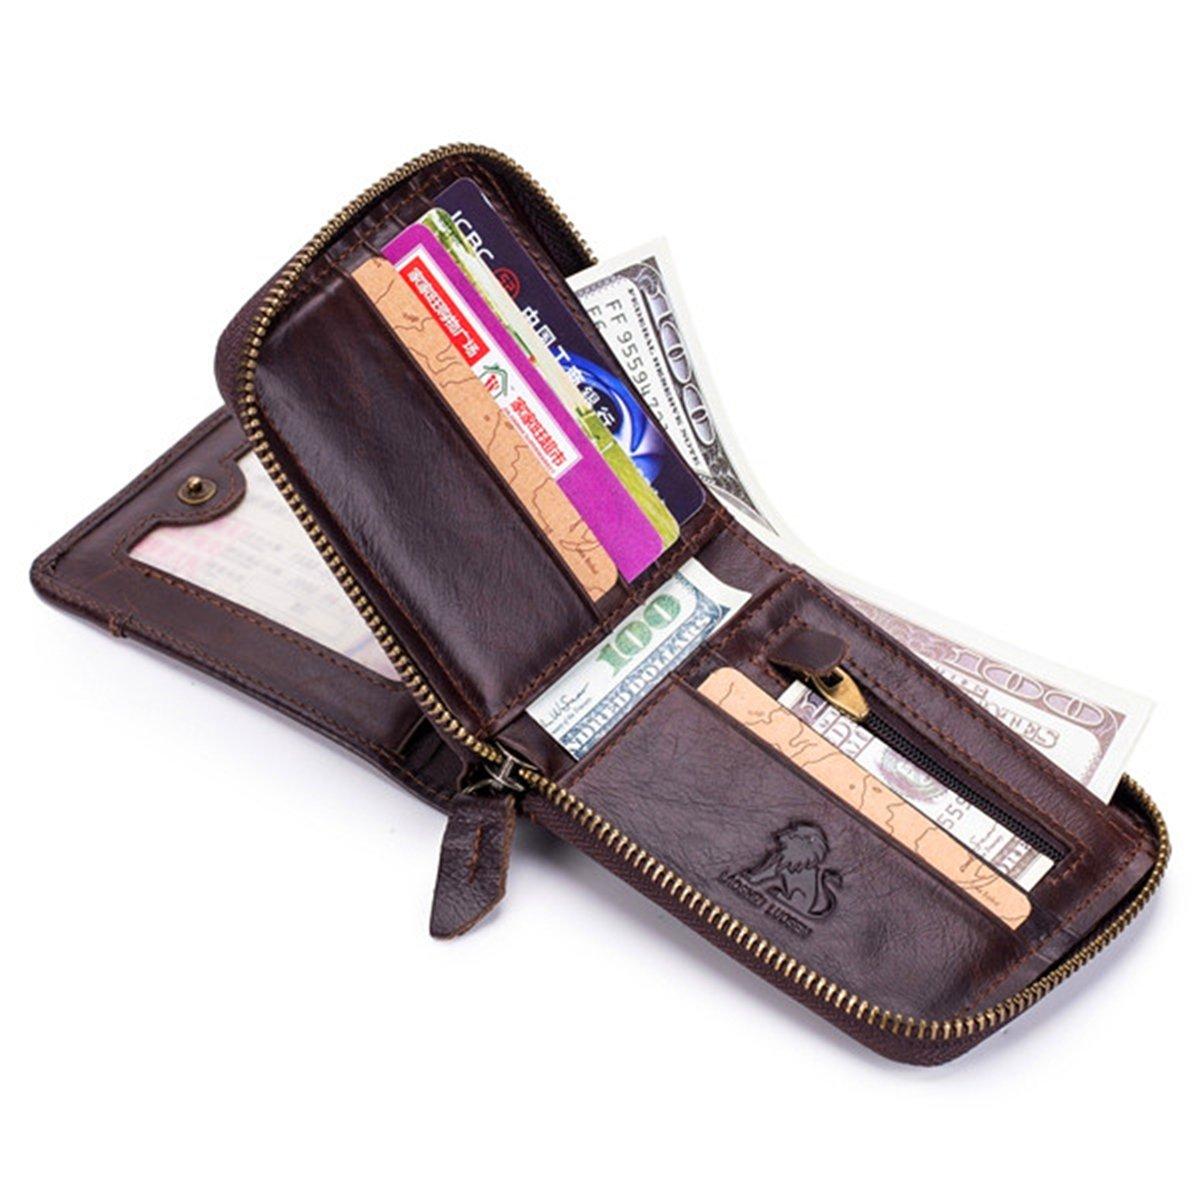 JOSEKO Card Holder Wallet, RFID Antimagnetic Vintage Genuine Leather 13 Card Slots Coin Bag Trifold Wallet for Men Black 3.54''x 1.18''x 4.72''(LxWxH)